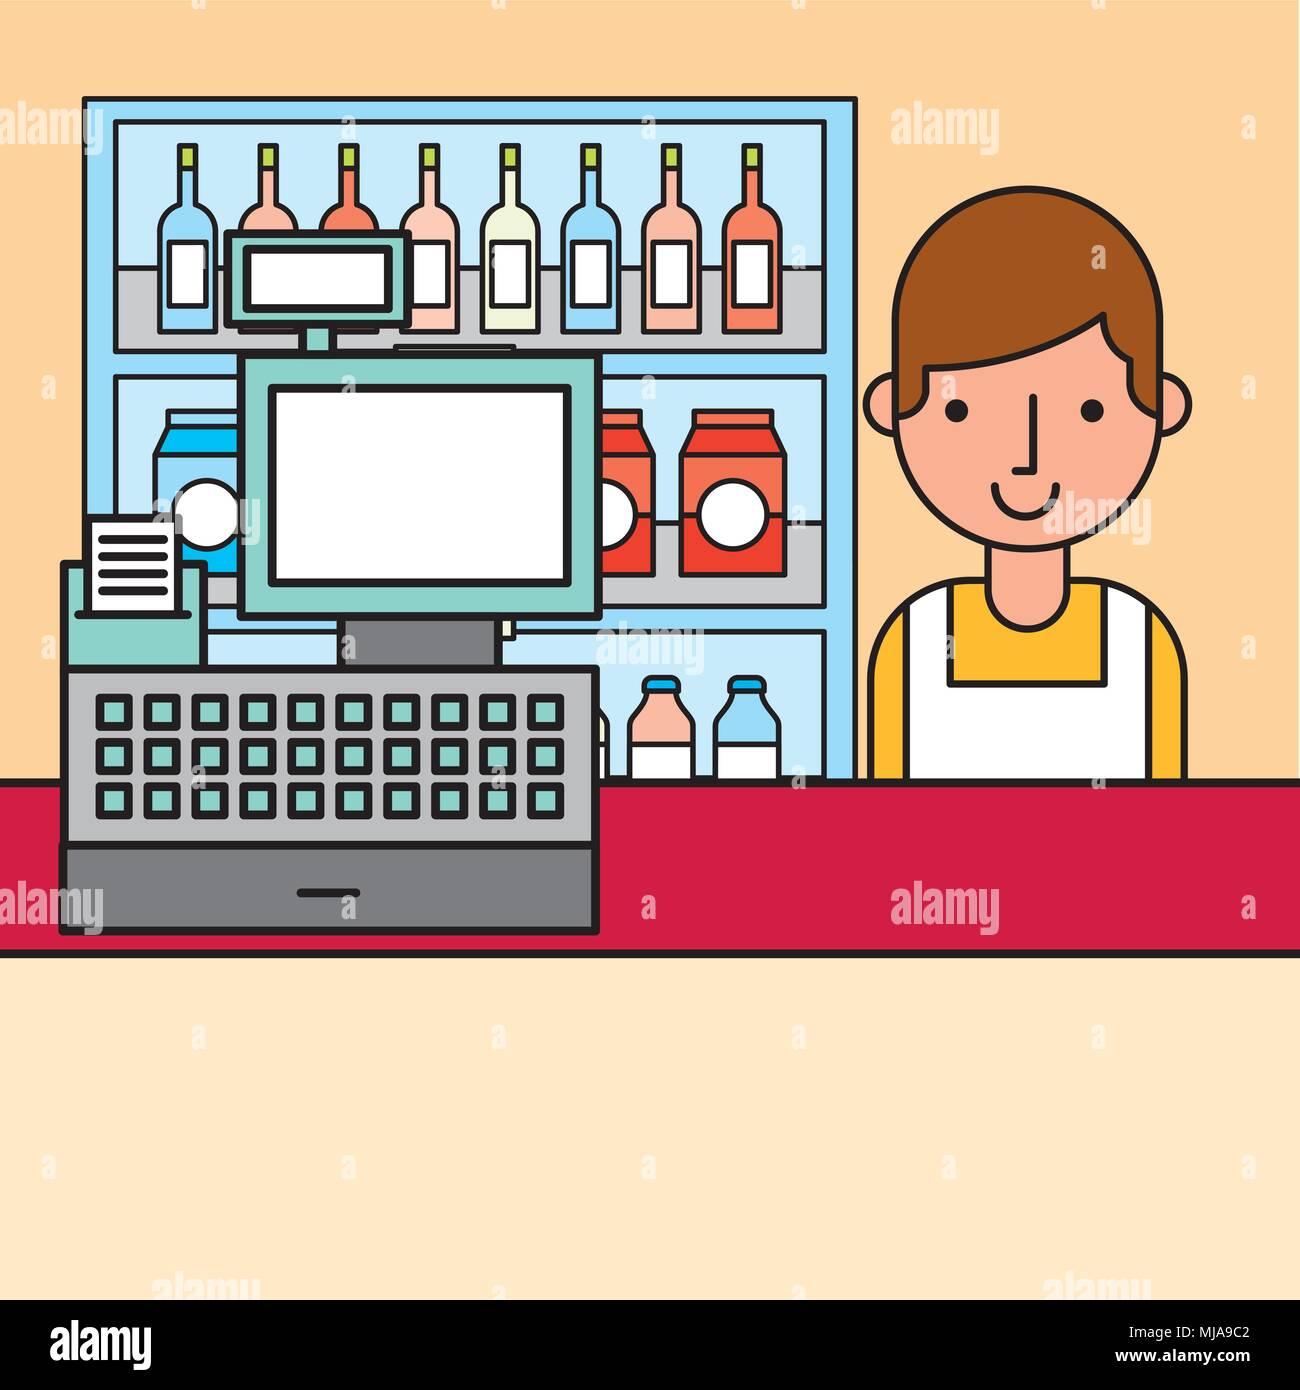 Cashier Cartoons: Cashier Stock Vector Images